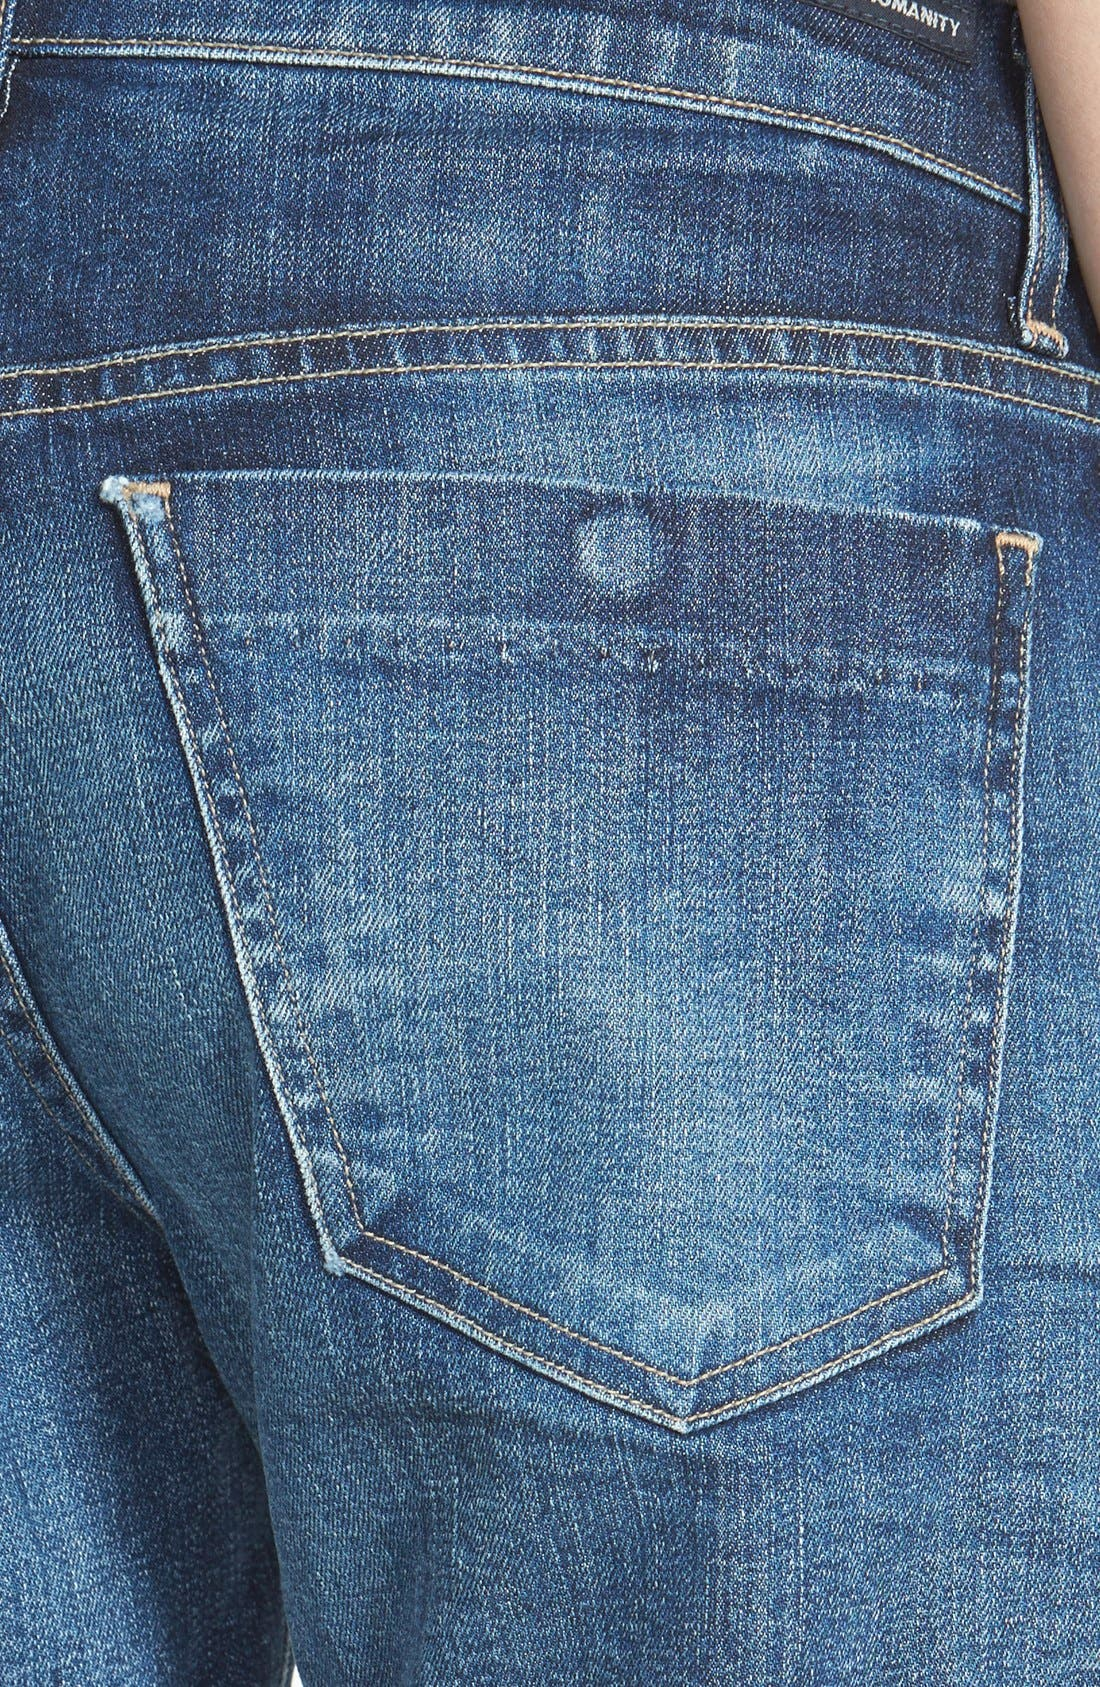 'Skyler' Low Rise Denim Shorts,                             Alternate thumbnail 3, color,                             Blue Ridge